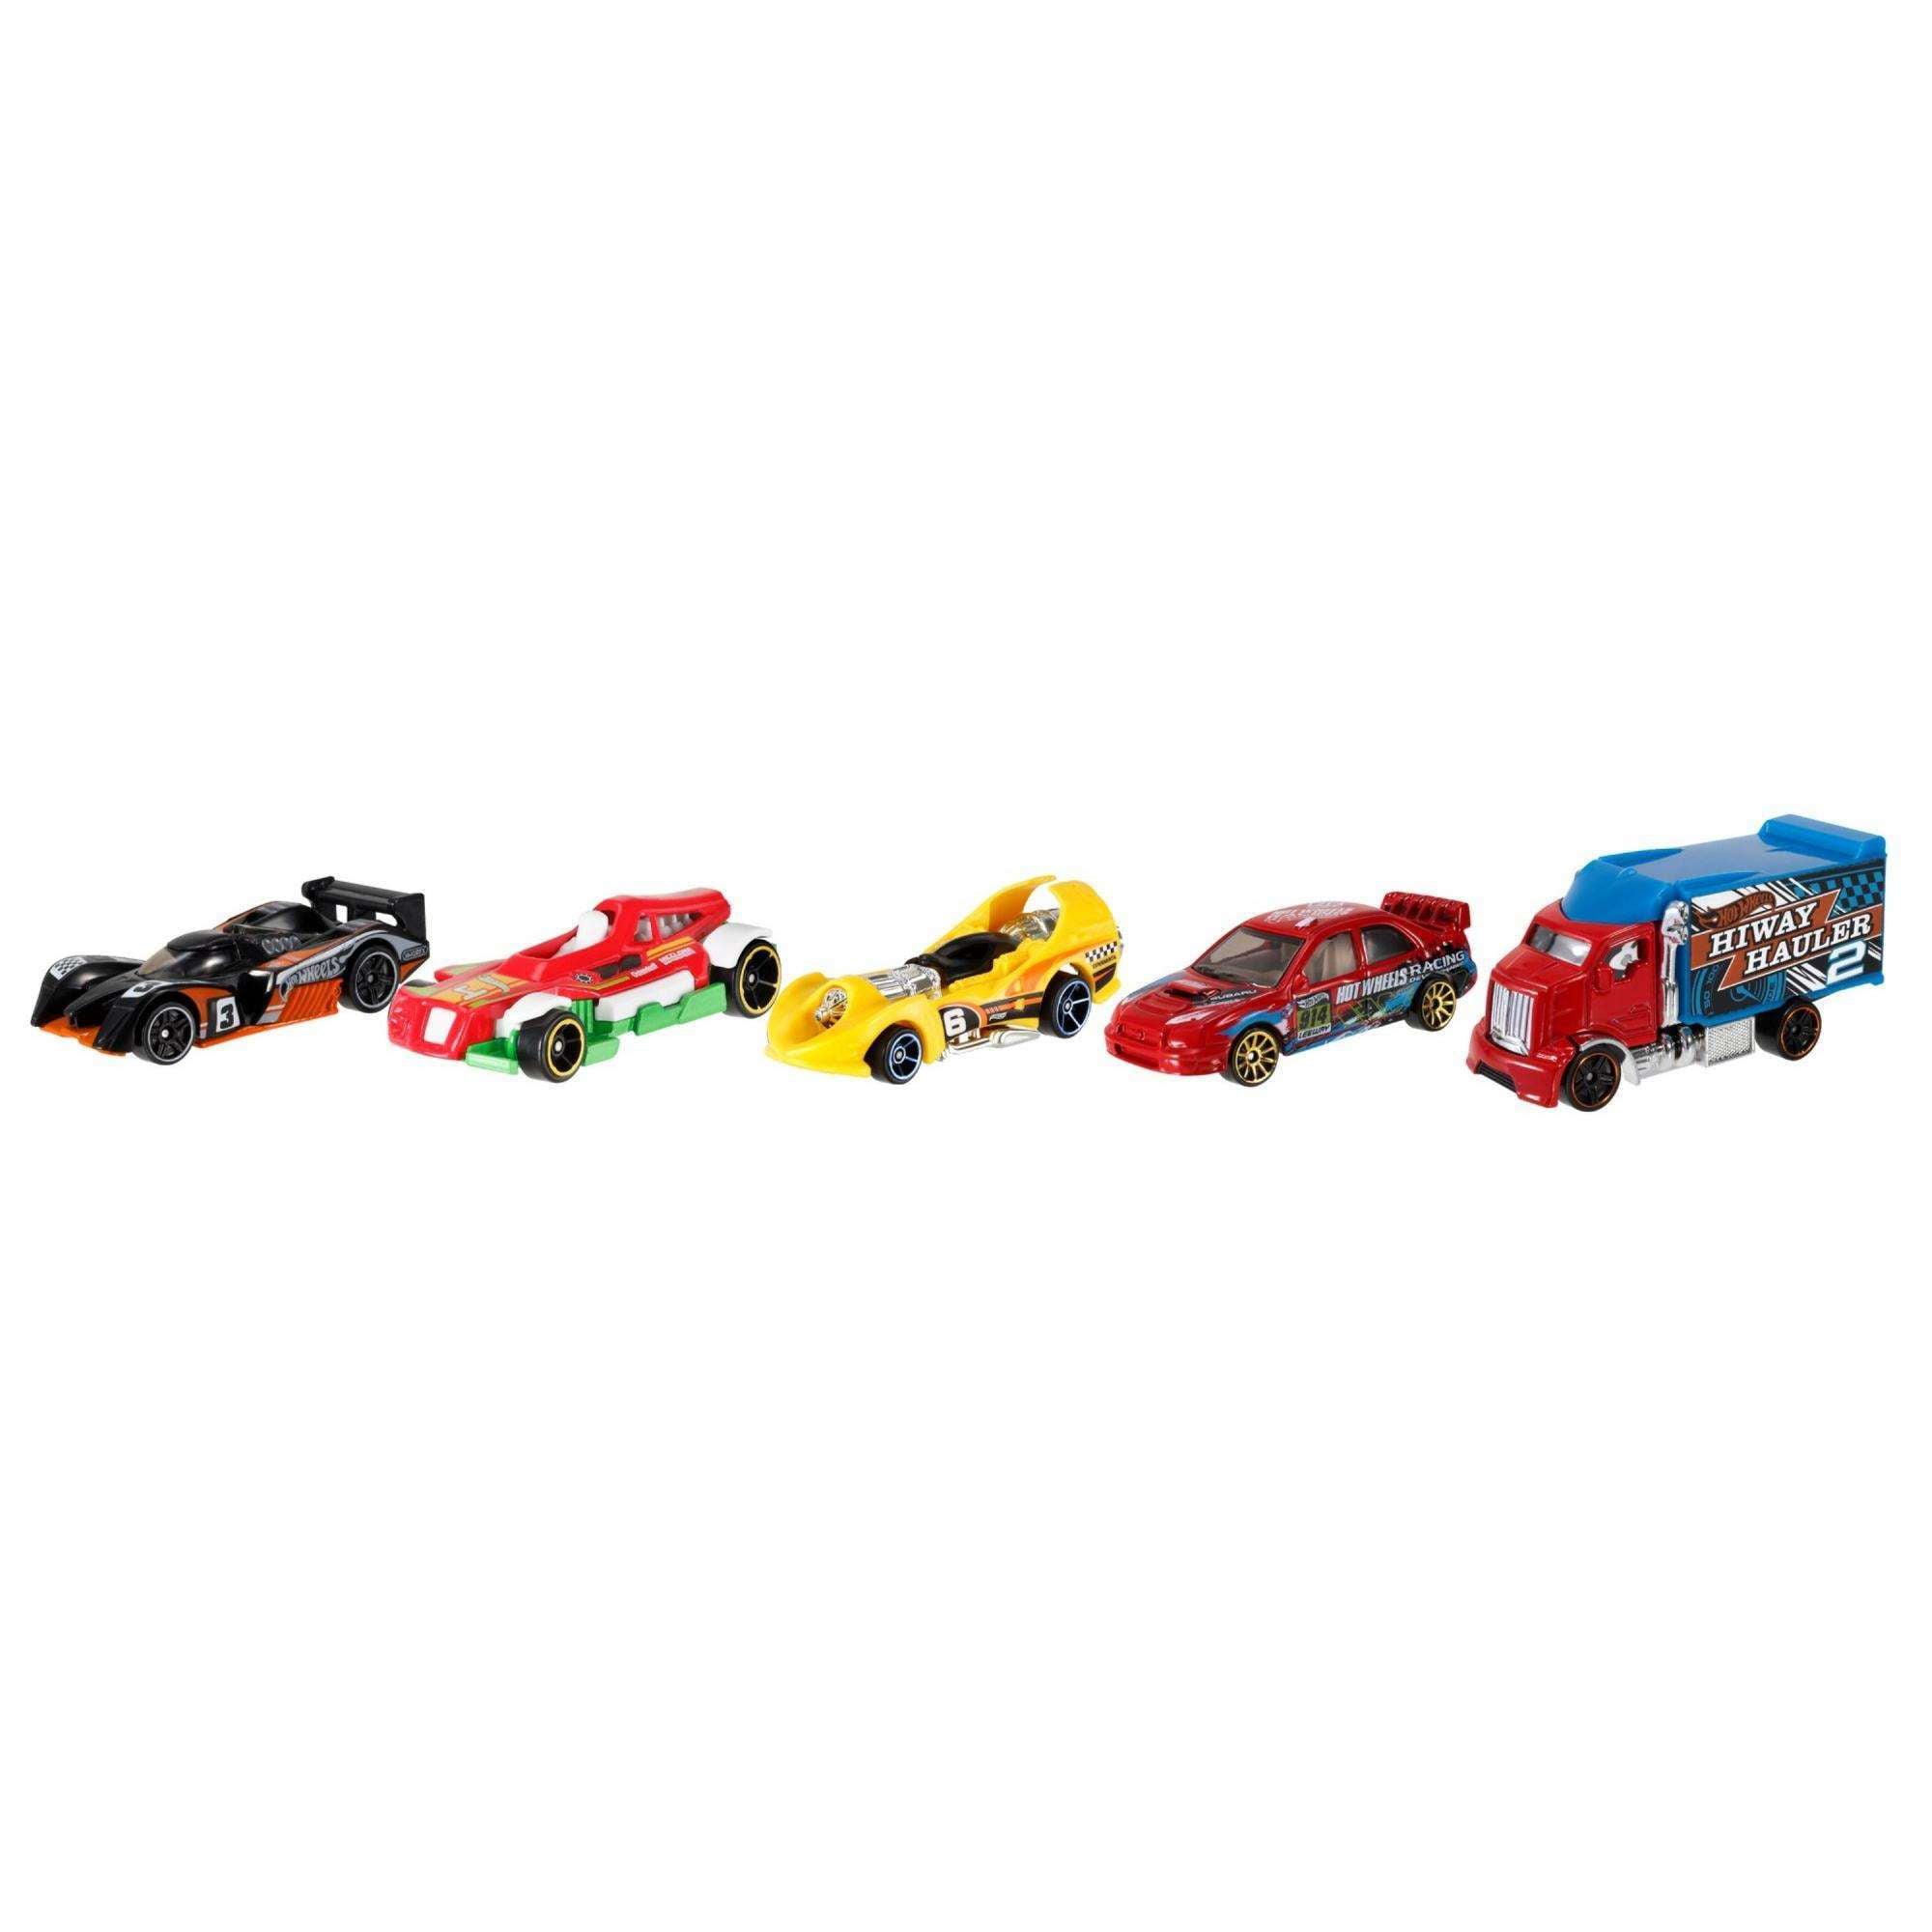 Hot Wheels 5-Car Gift Pack (Styles May Vary) - Walmart.com